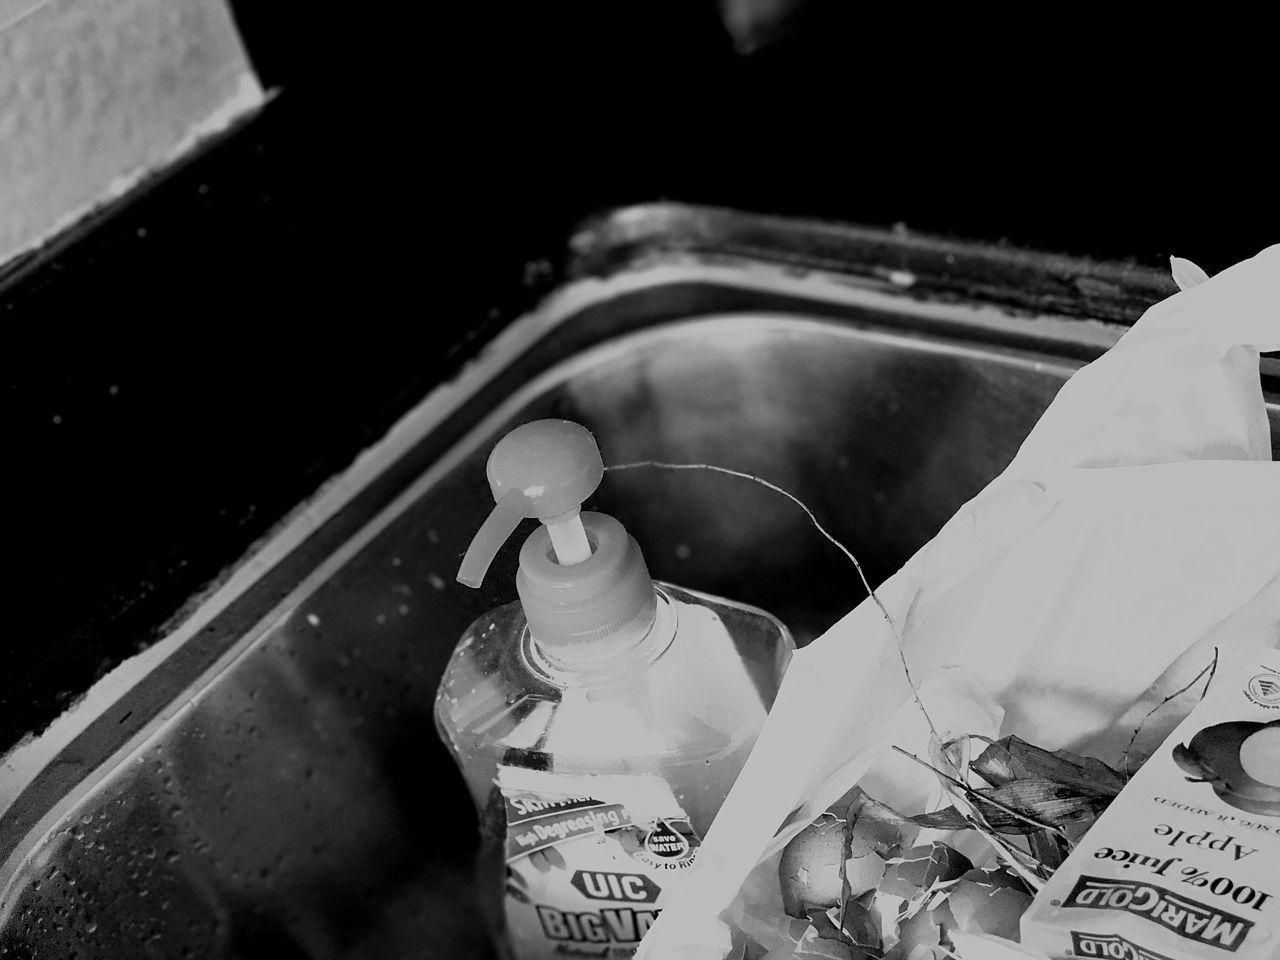 BRACKET Dishwasher Dishwashing Soap No People Old-fashioned Nautical Vessel Close-up Indoors  Day Egg Shell Egg Shells Experimental Monochrome Monochrome Photography Black Blackandwhite Black And White Bracket Kitchen Kitchen Things Kitchen Sink Sink Dish Rubbish Leaves